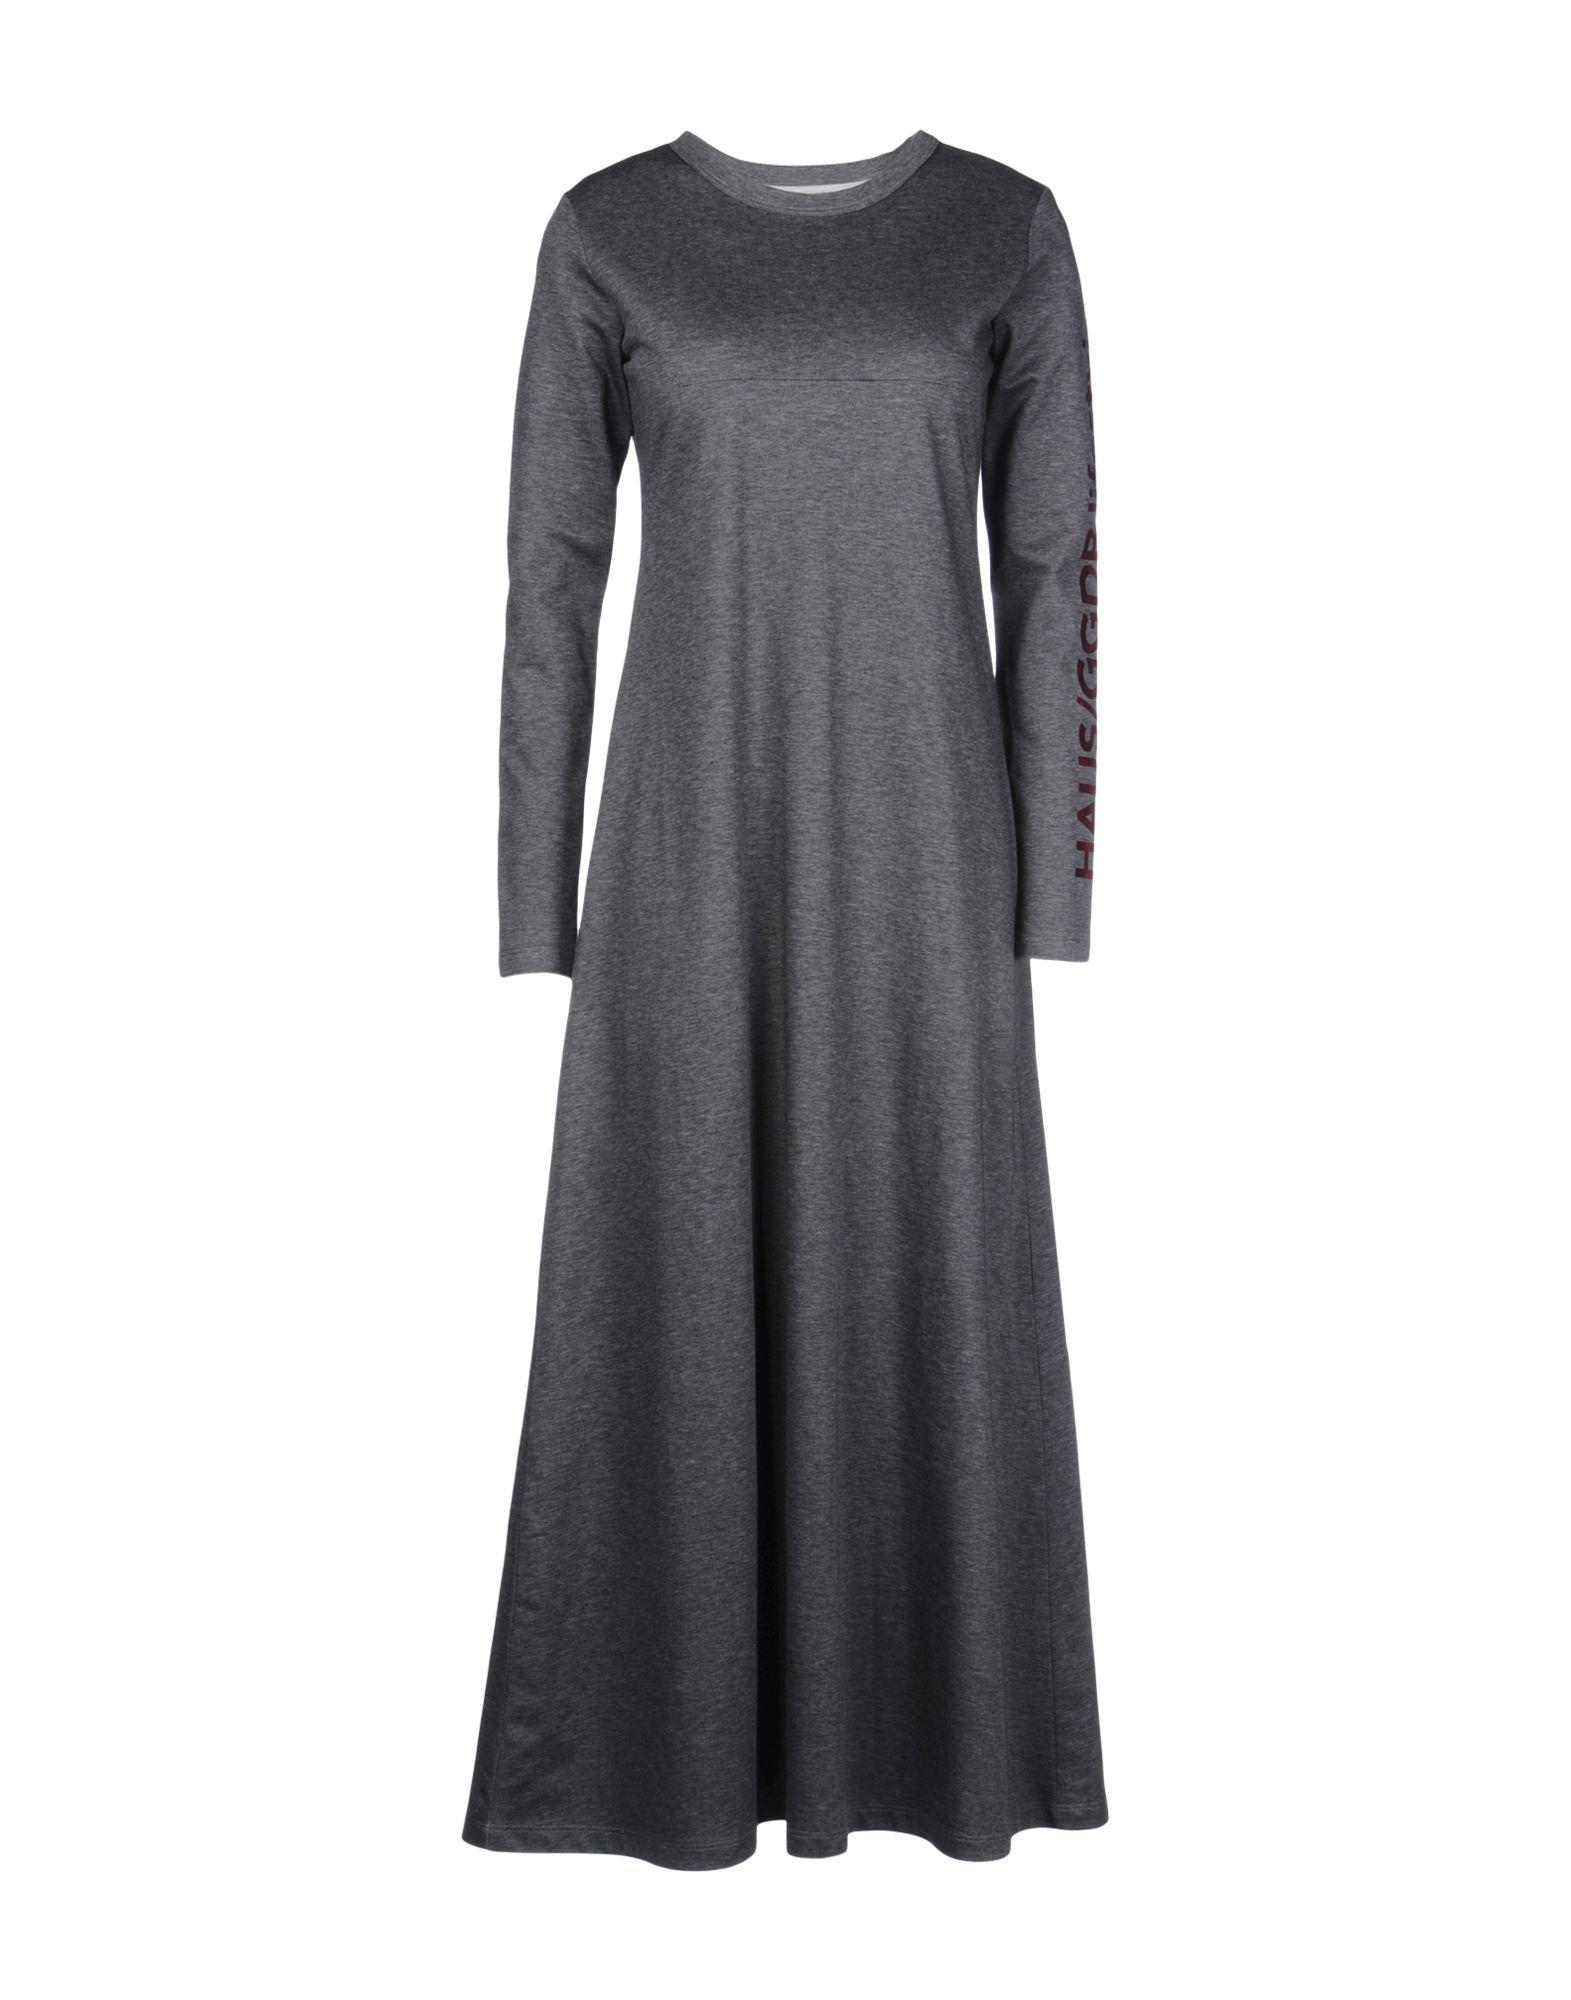 DRESSES - 3/4 length dresses Golden Goose 1S7wiL